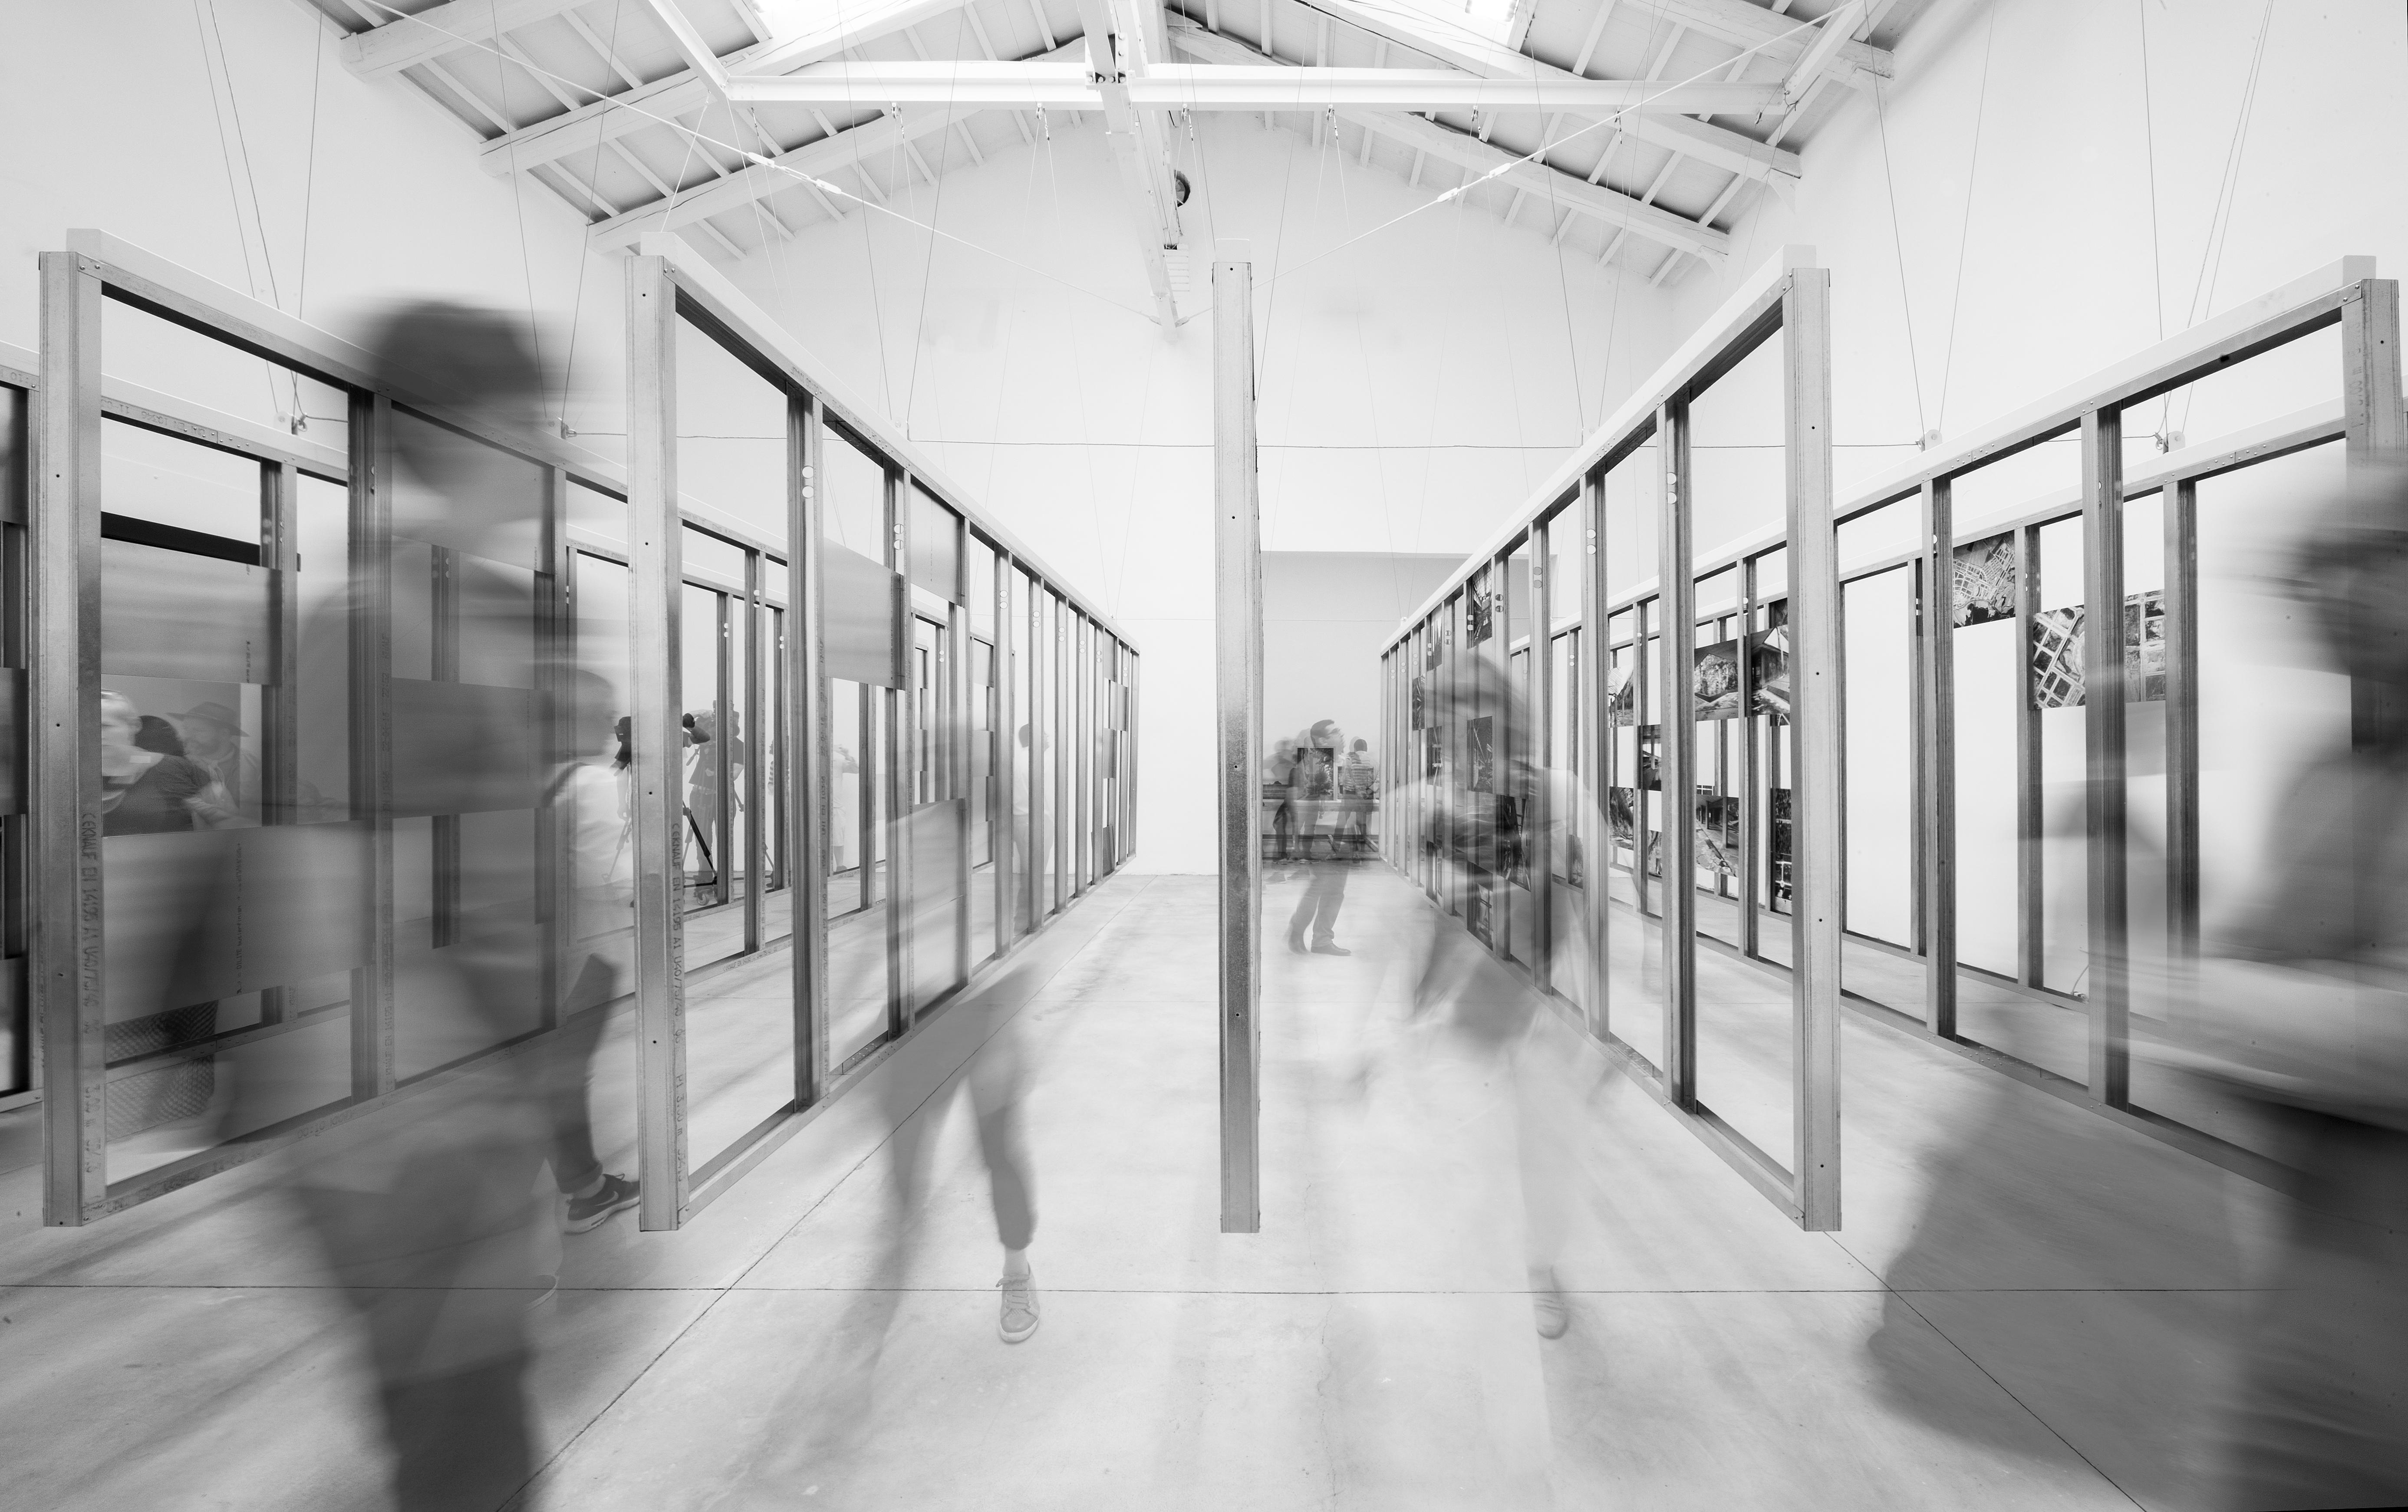 La biennale di venezia 2016 juan rodr guez for Biennale venezia 2016